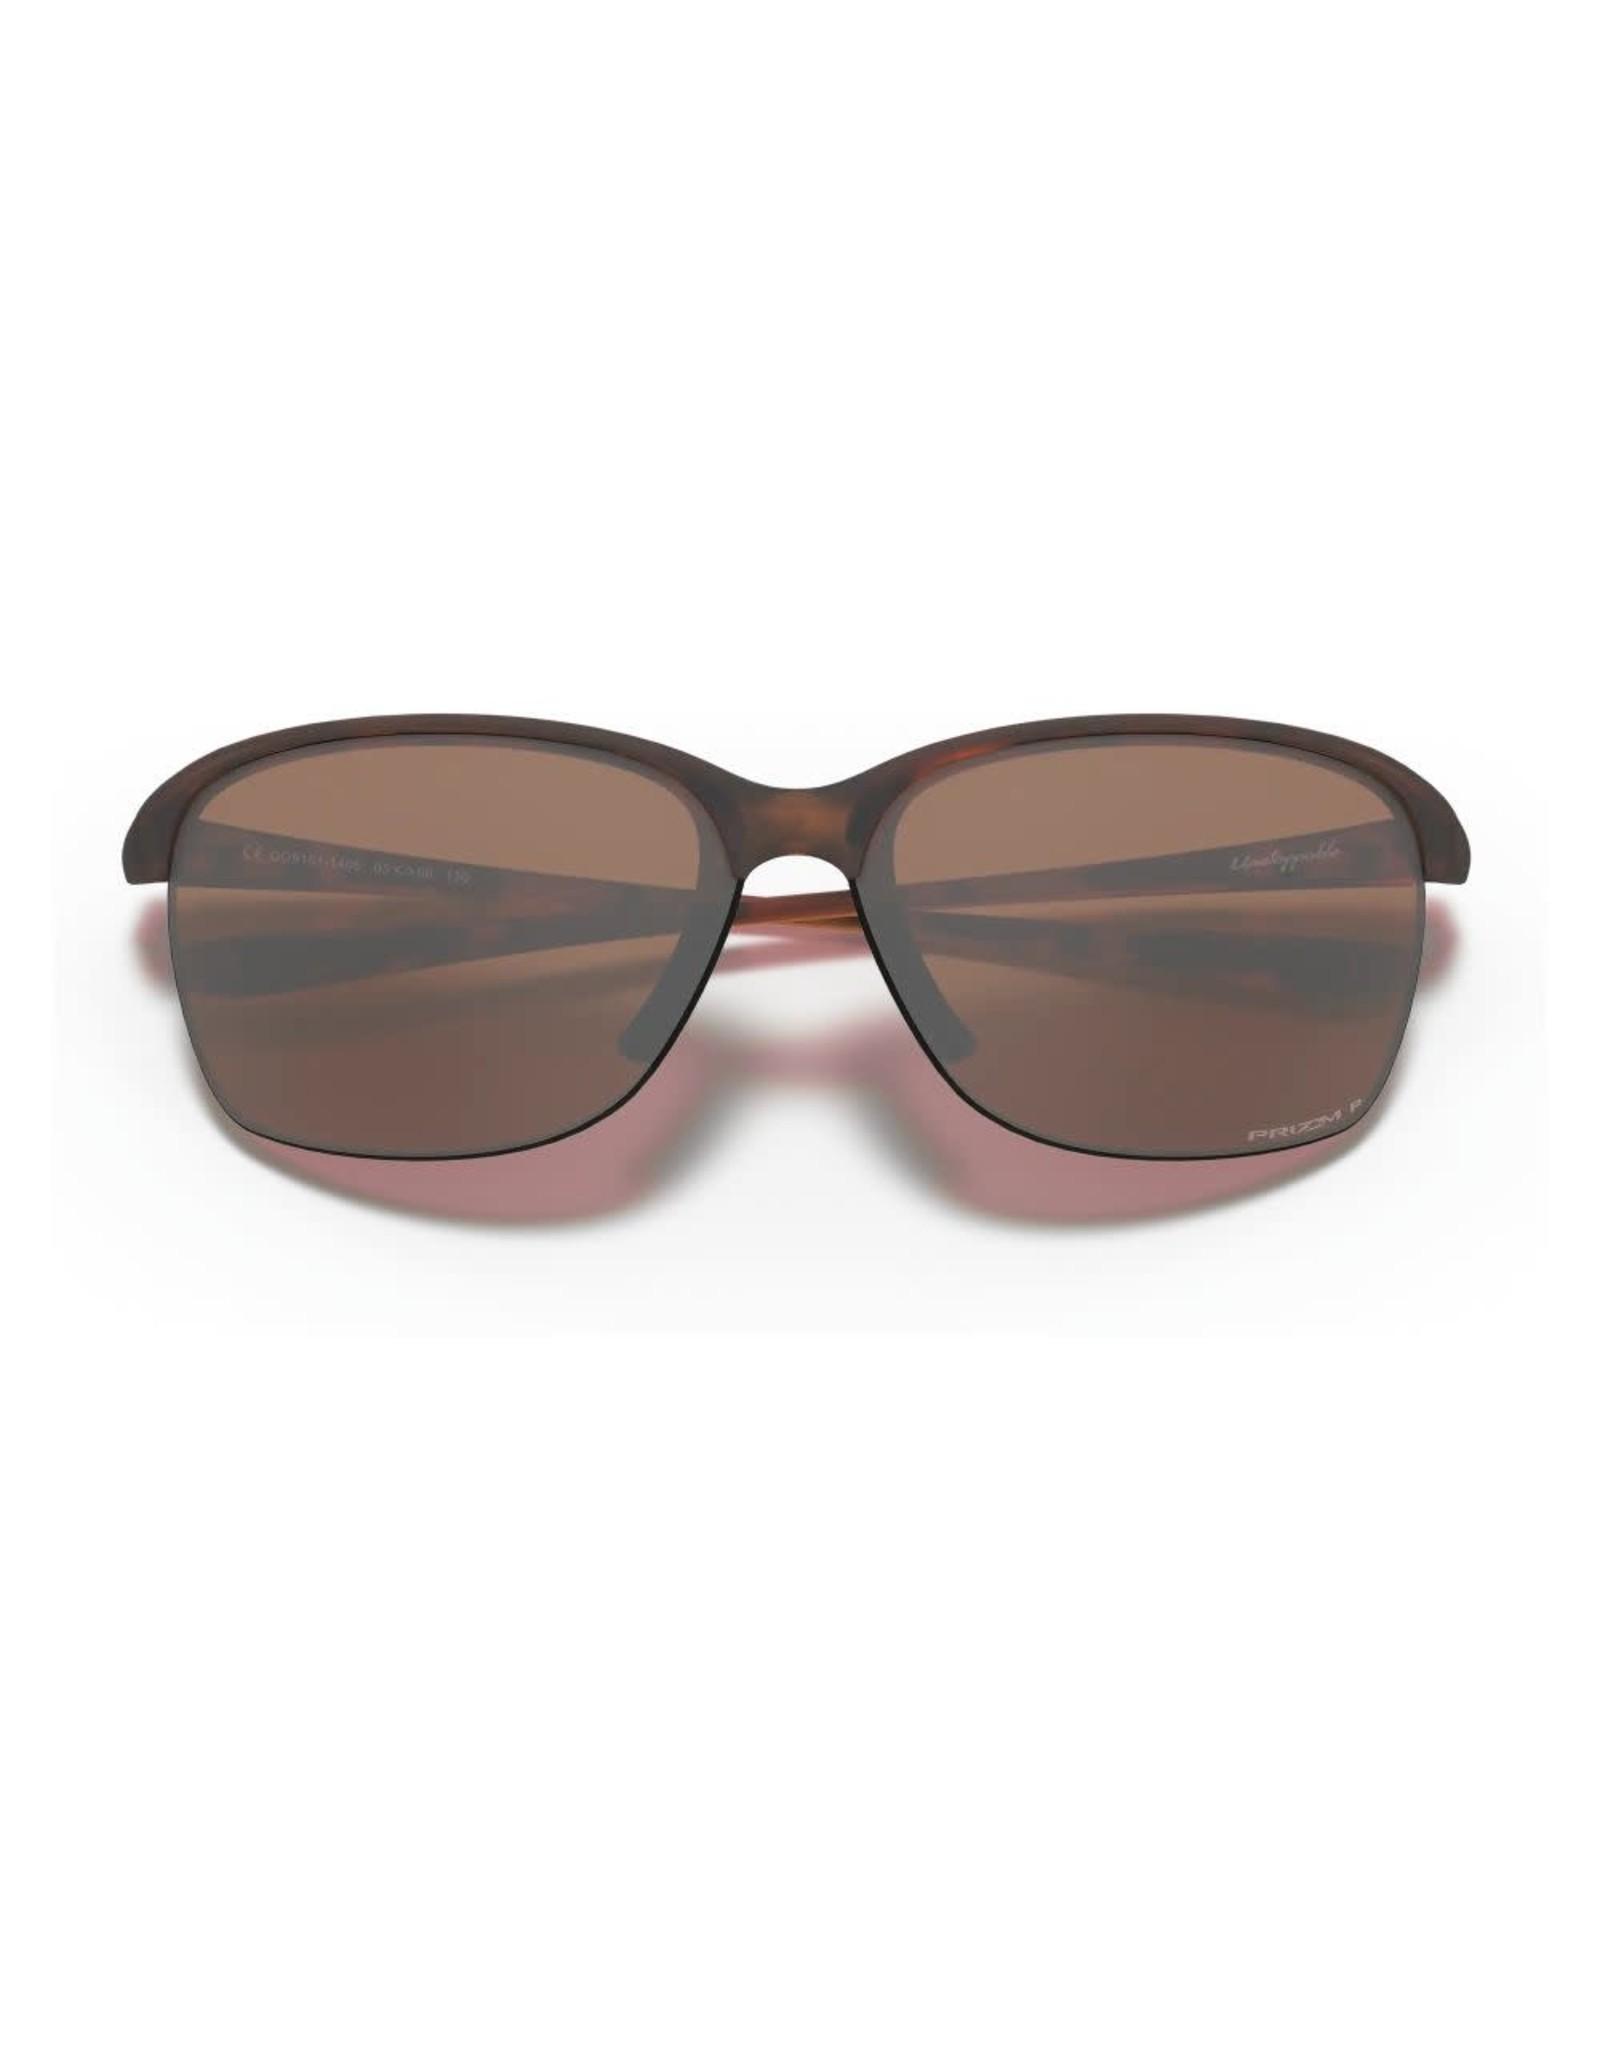 OAKLEY Oakley Unstoppable lunette matte tortoise prizm tungsten iridium polarisée